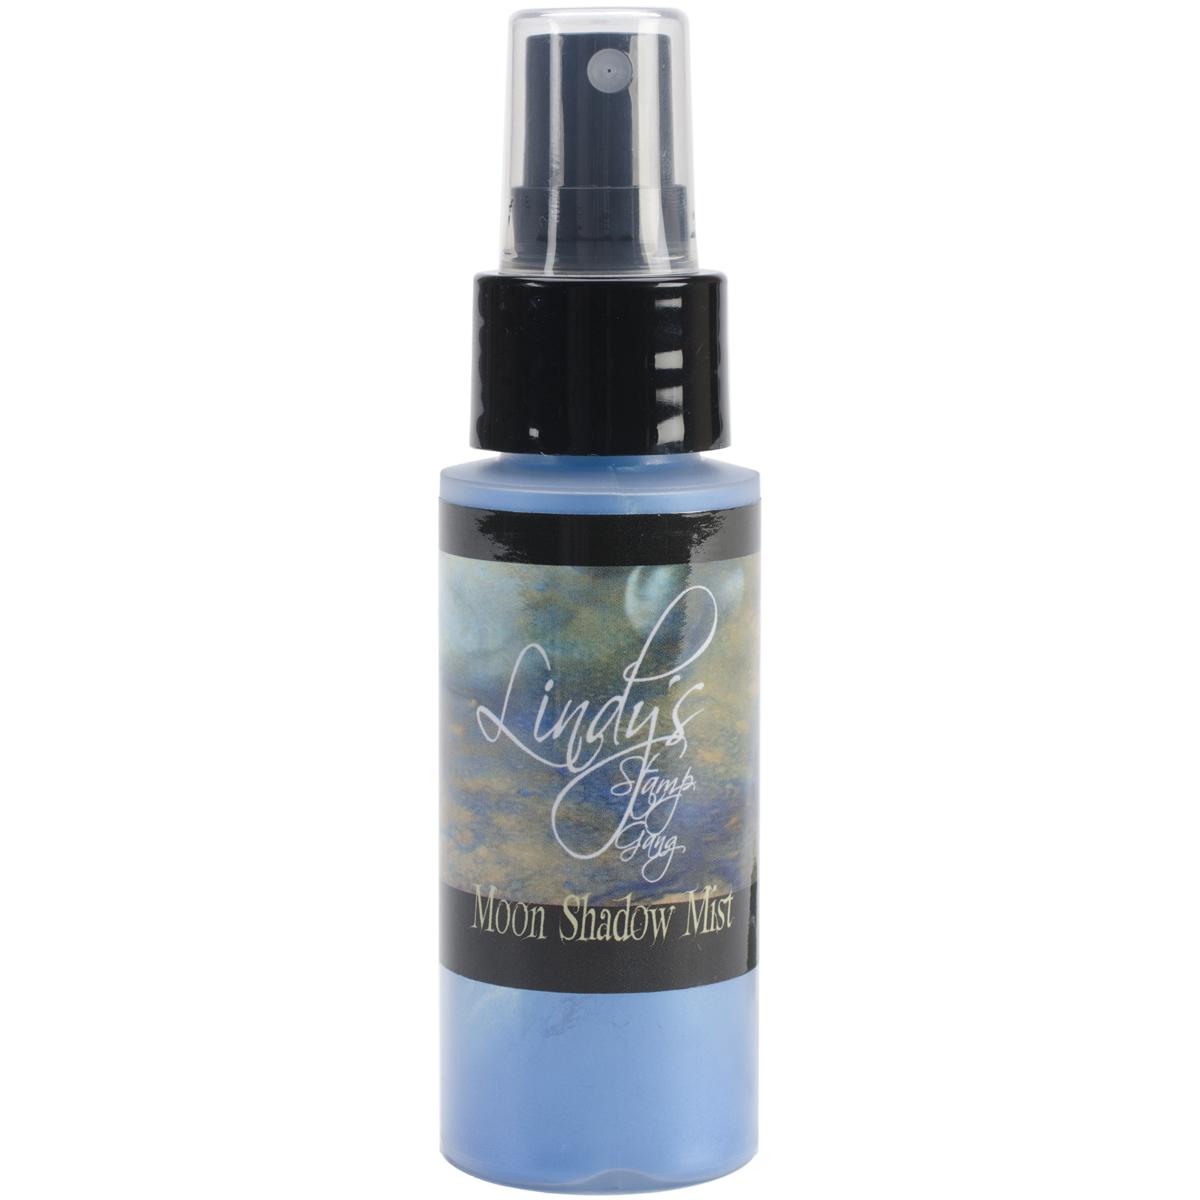 Lindy's Stamp Gang Moon Shadow Mist 2oz Bottle-SELECT COLOR